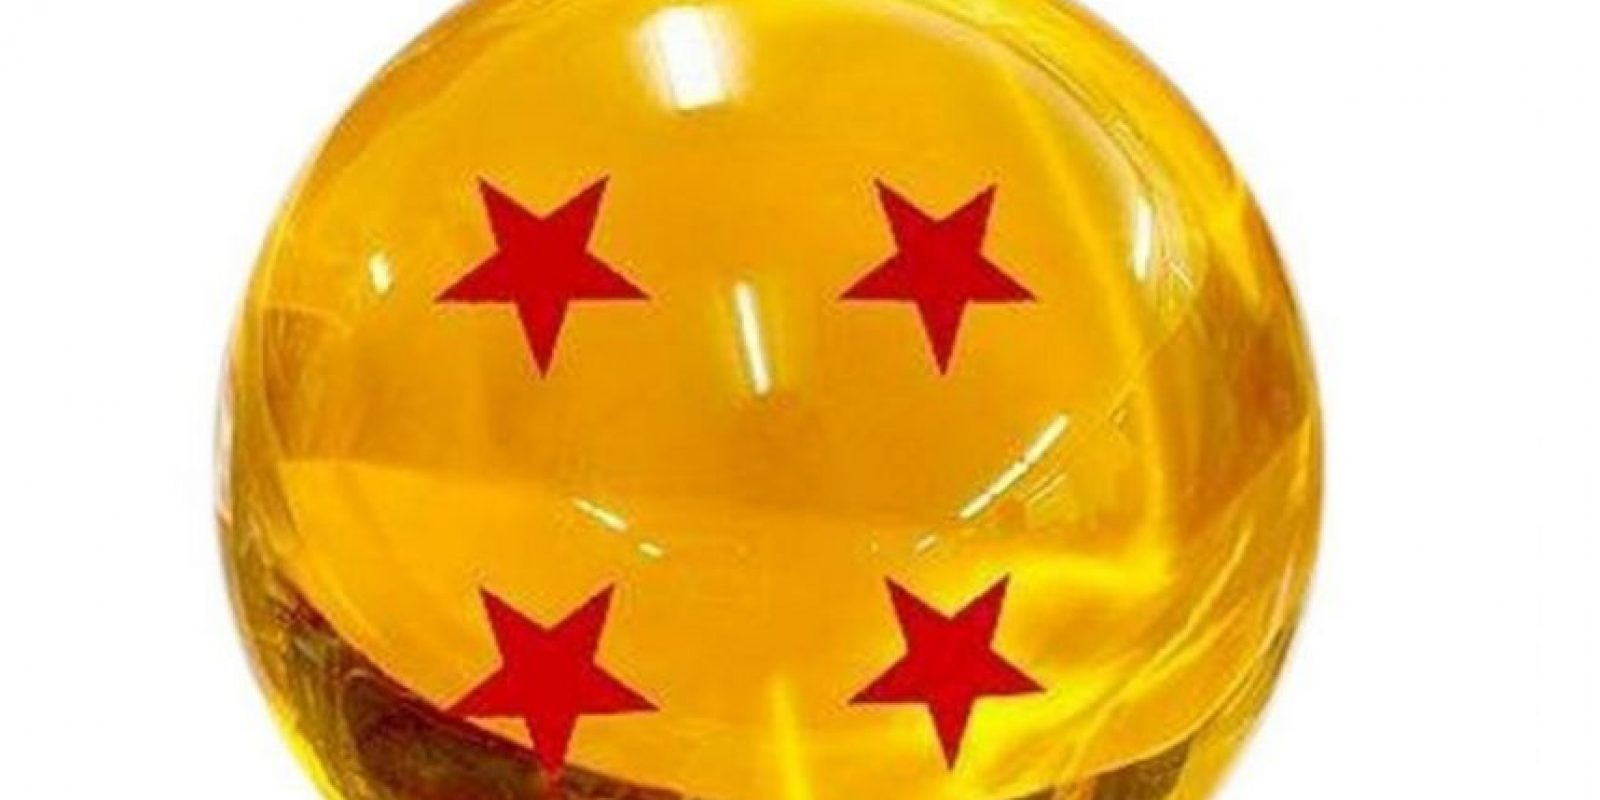 Son siete esferas mágicas de cristal en el manga y anime de Akira Toriyama Foto:Linio/Bandai